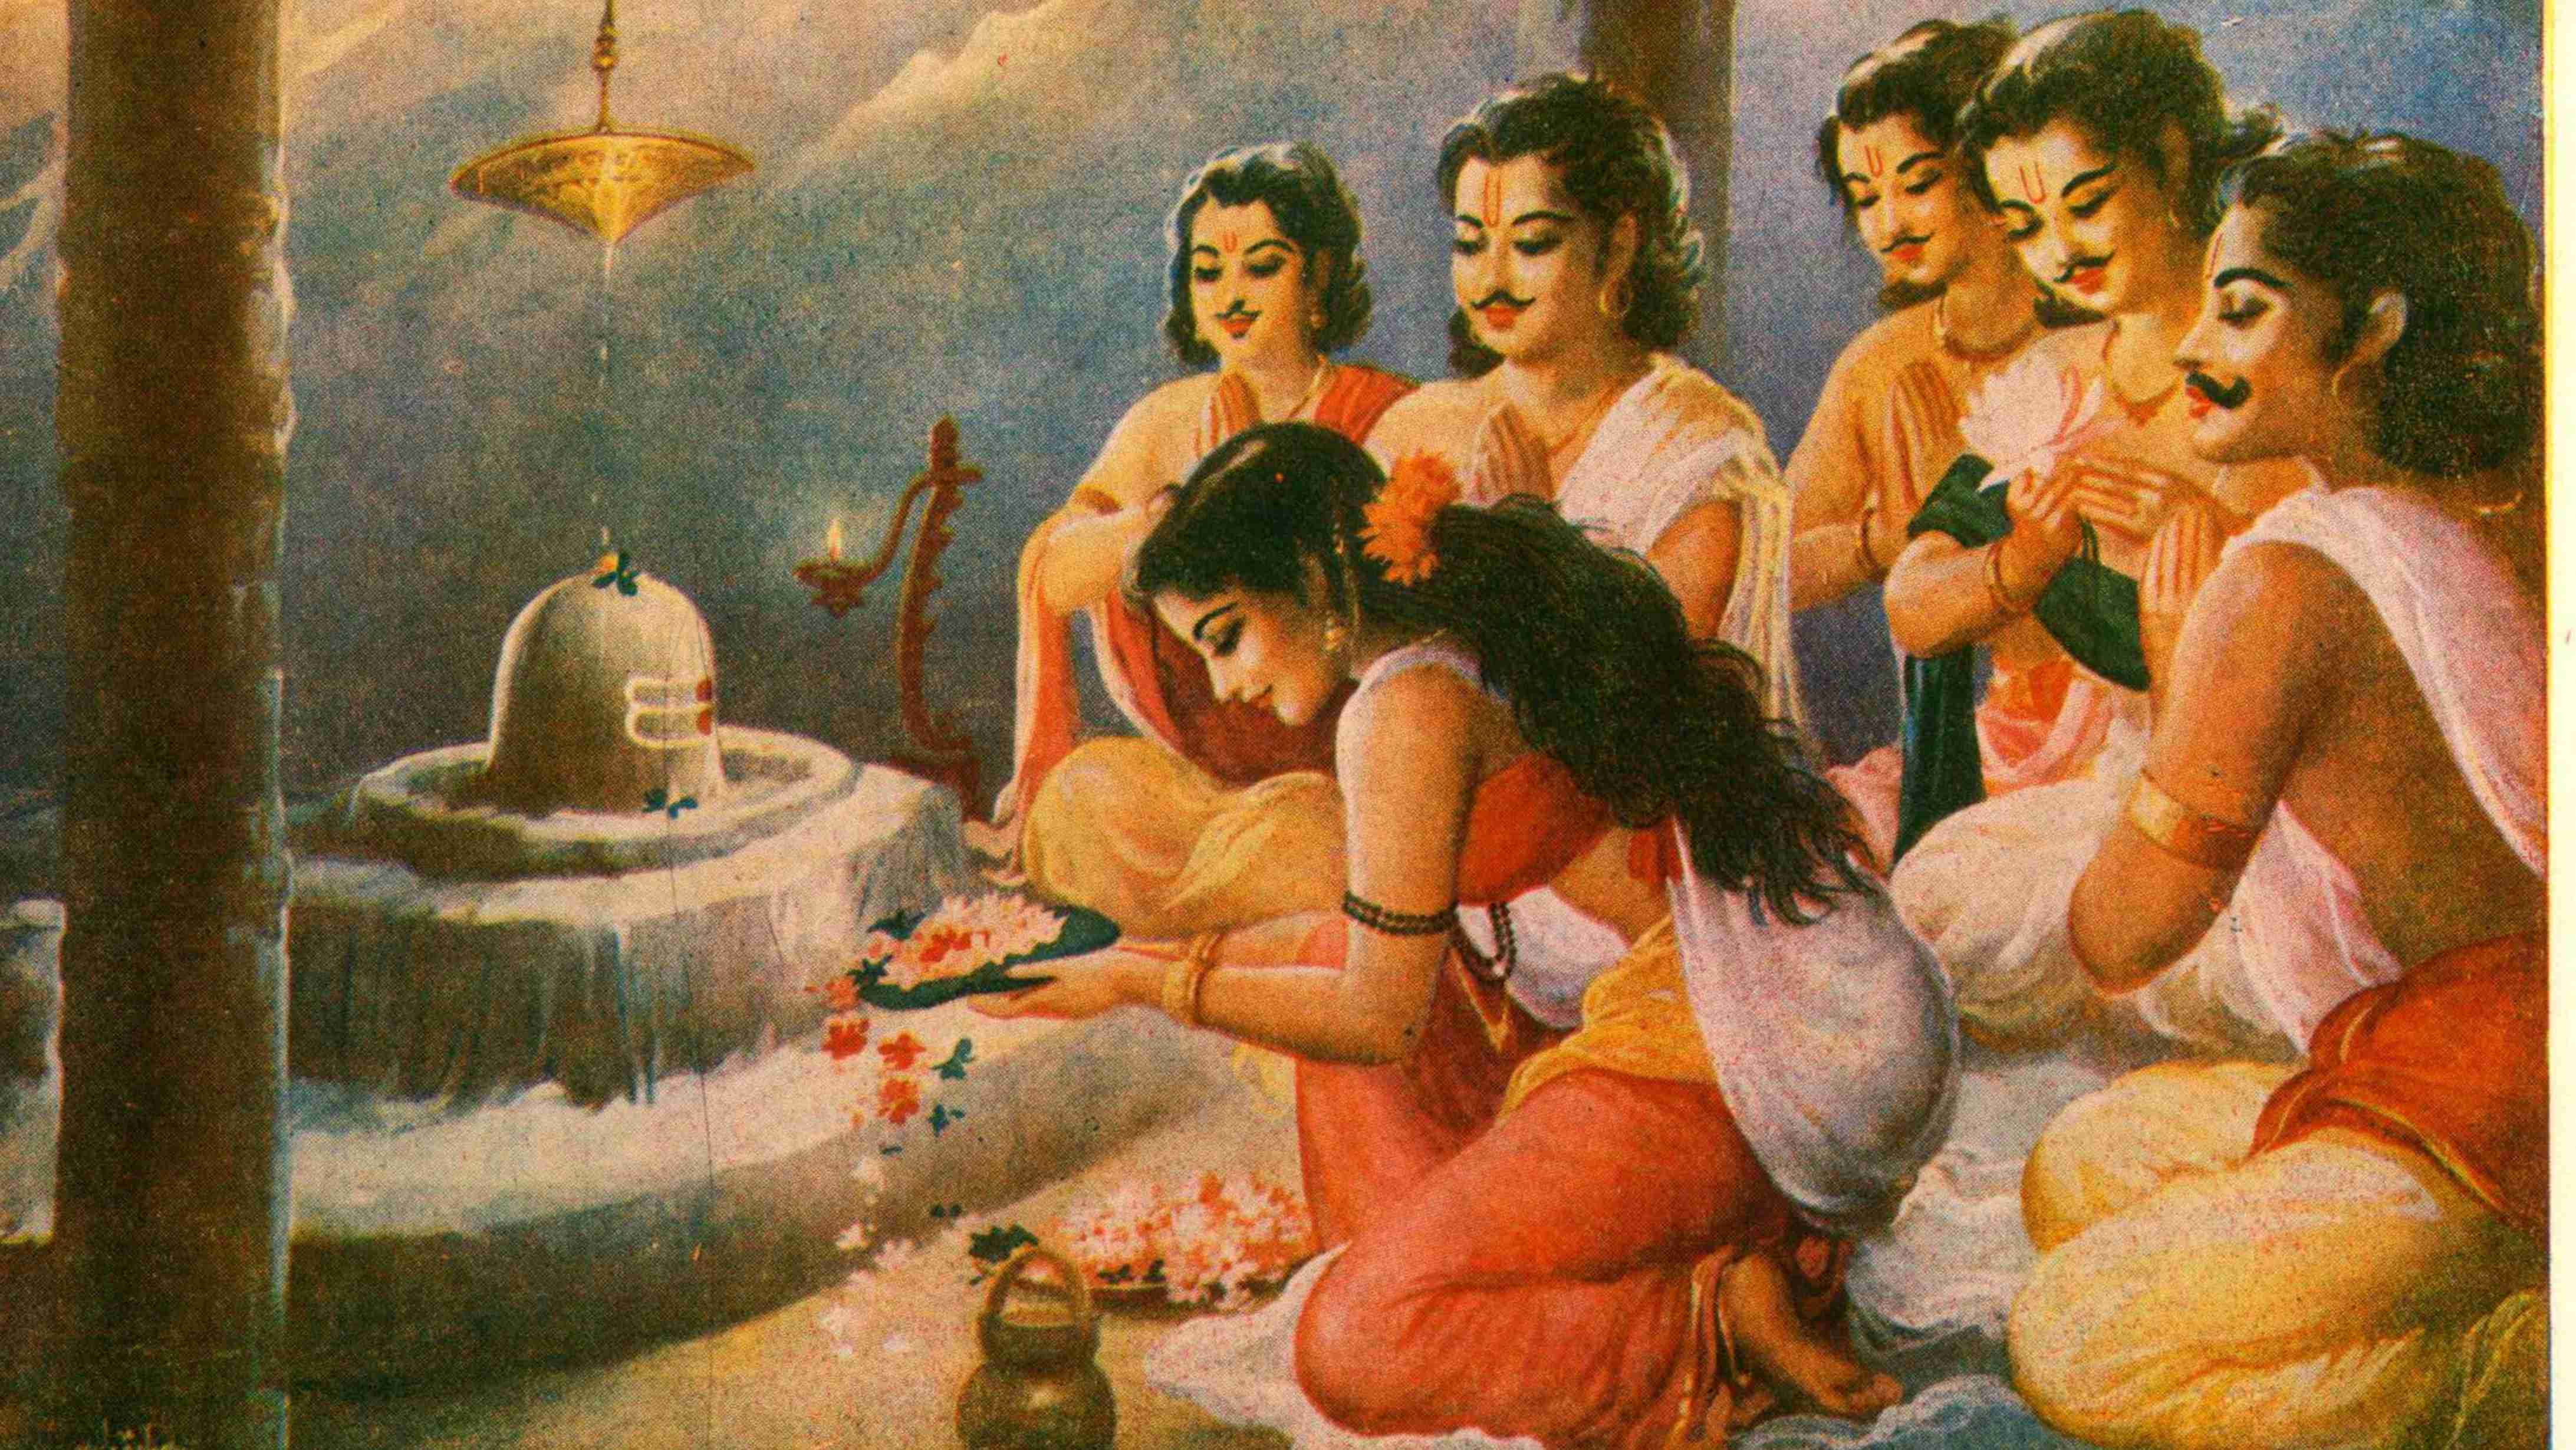 The Story of Pandavas